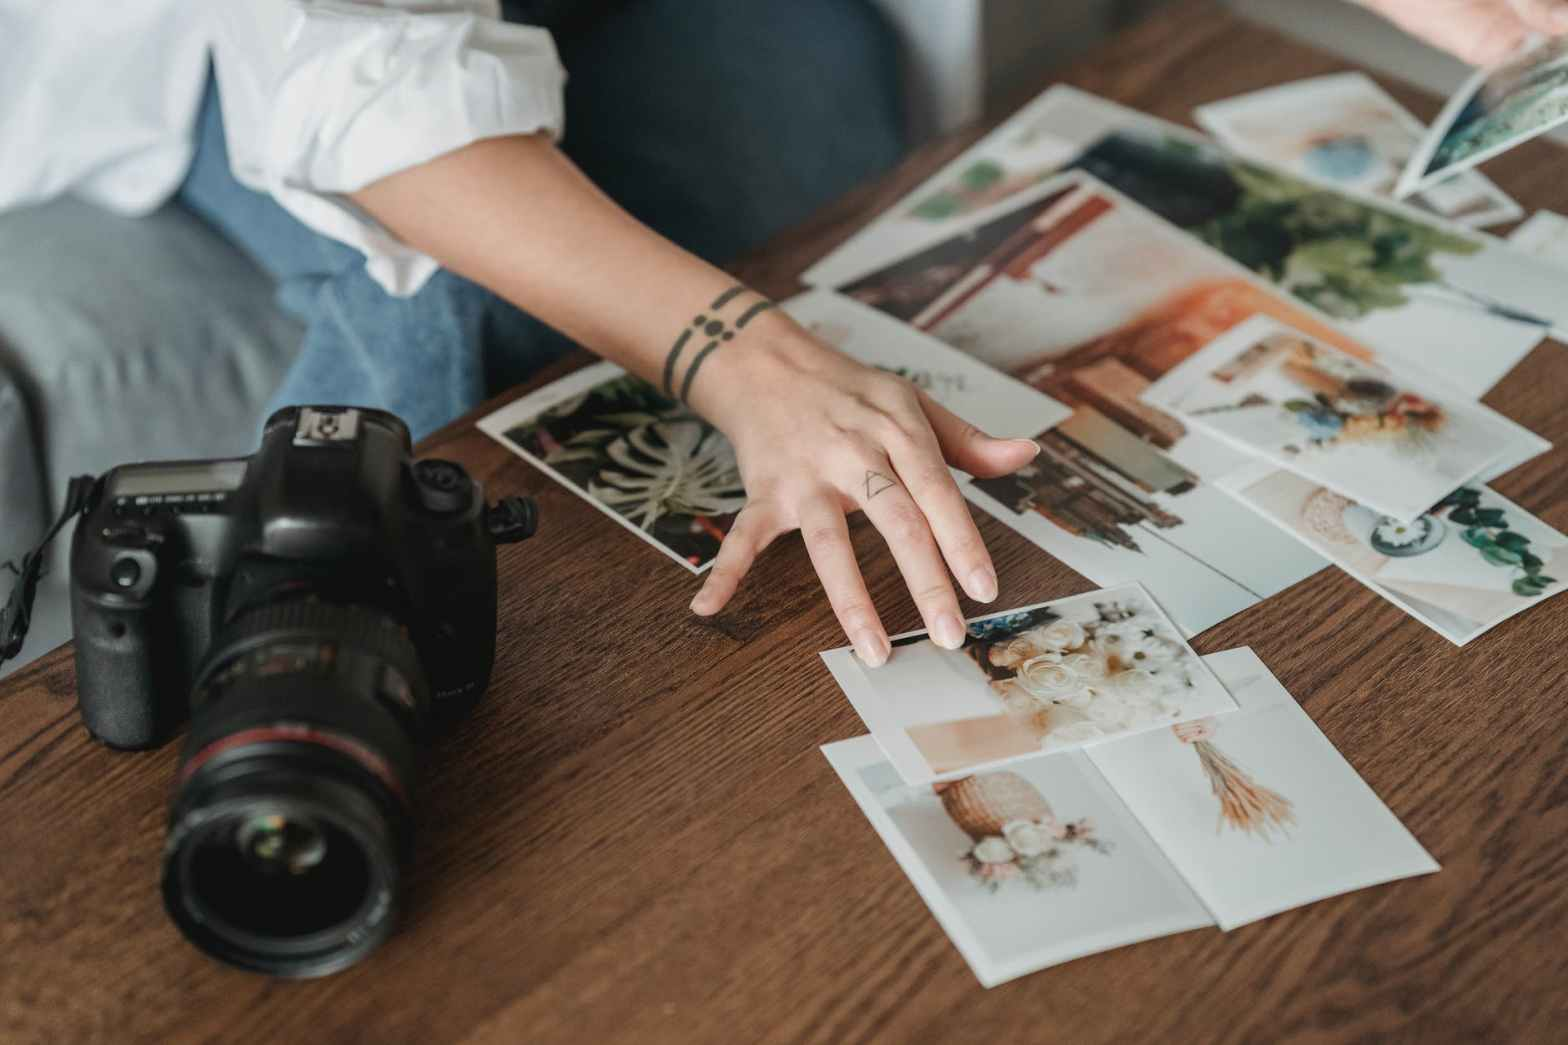 faceless photographer choosing photos at table with digital camera